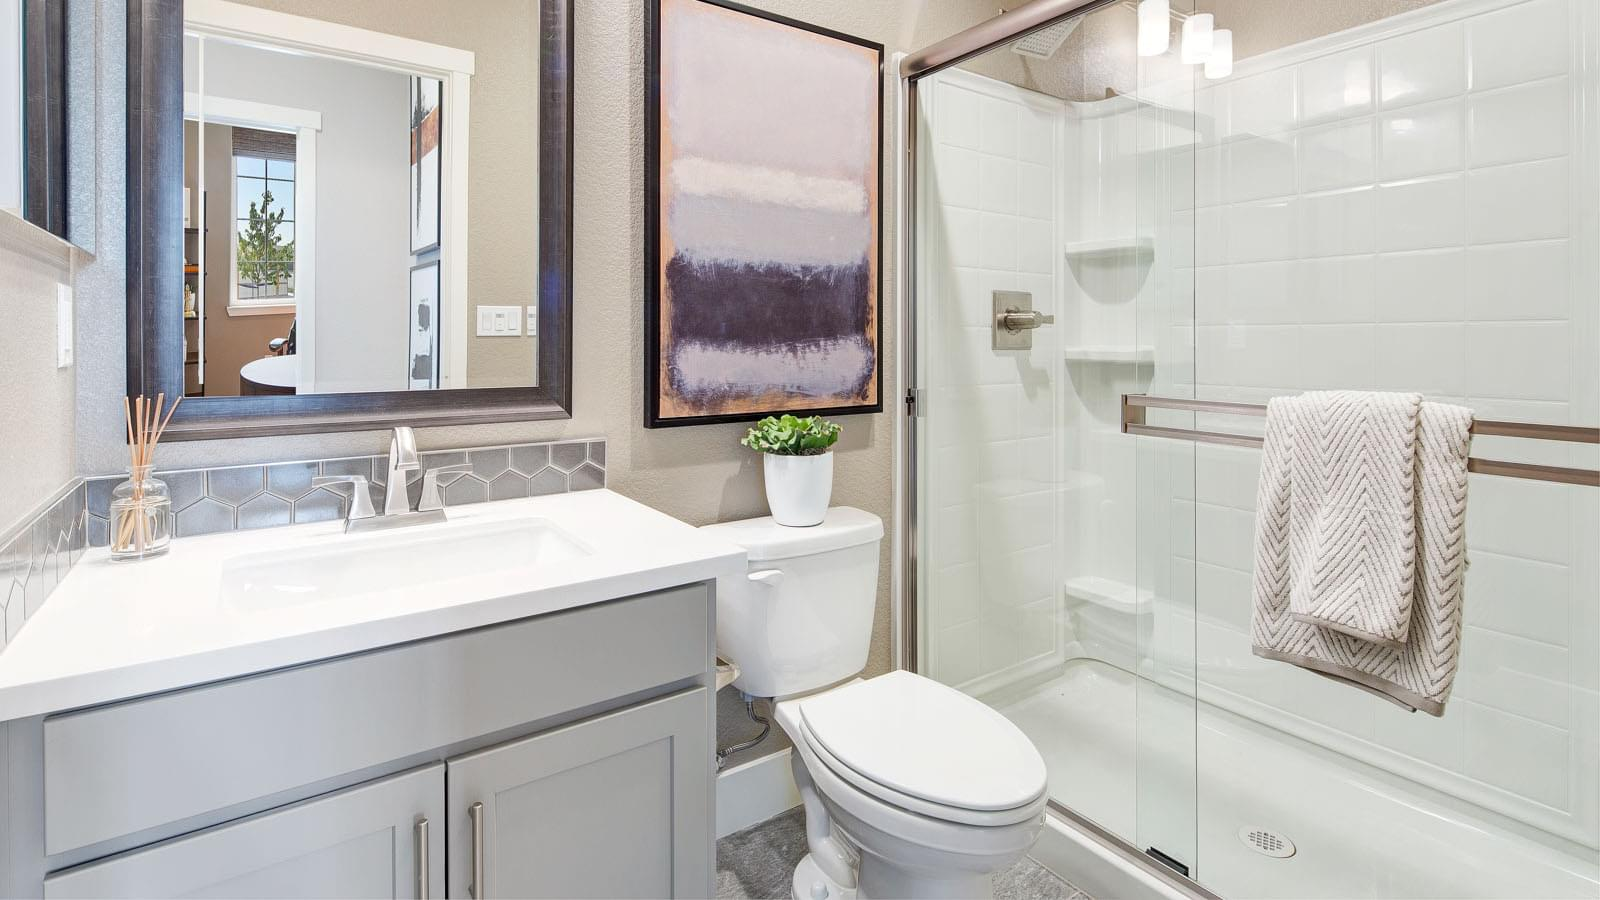 Residence 4 Bath 3